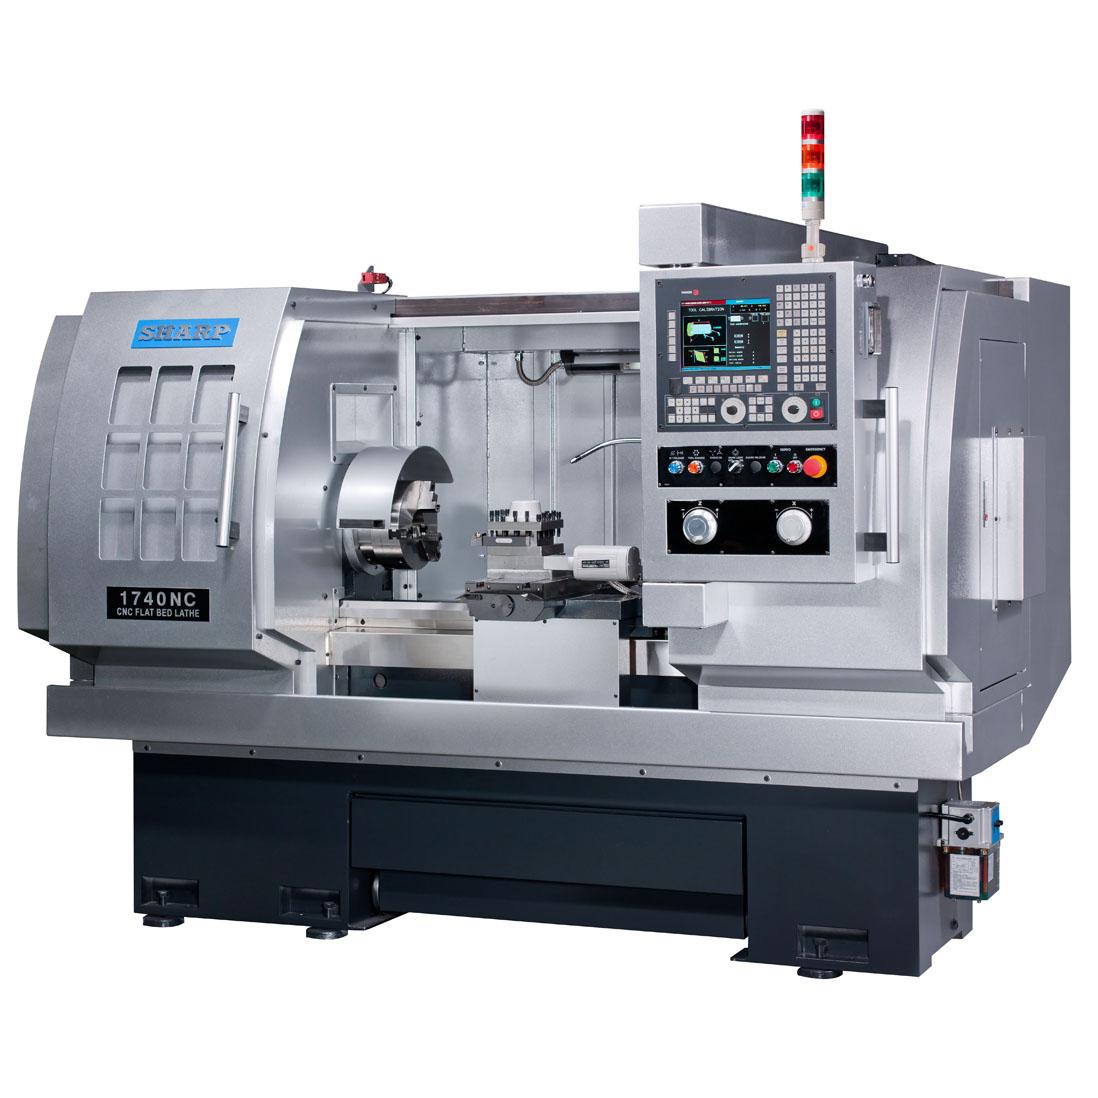 NEW SHARP 2040NC PRECISION CNC LATHE